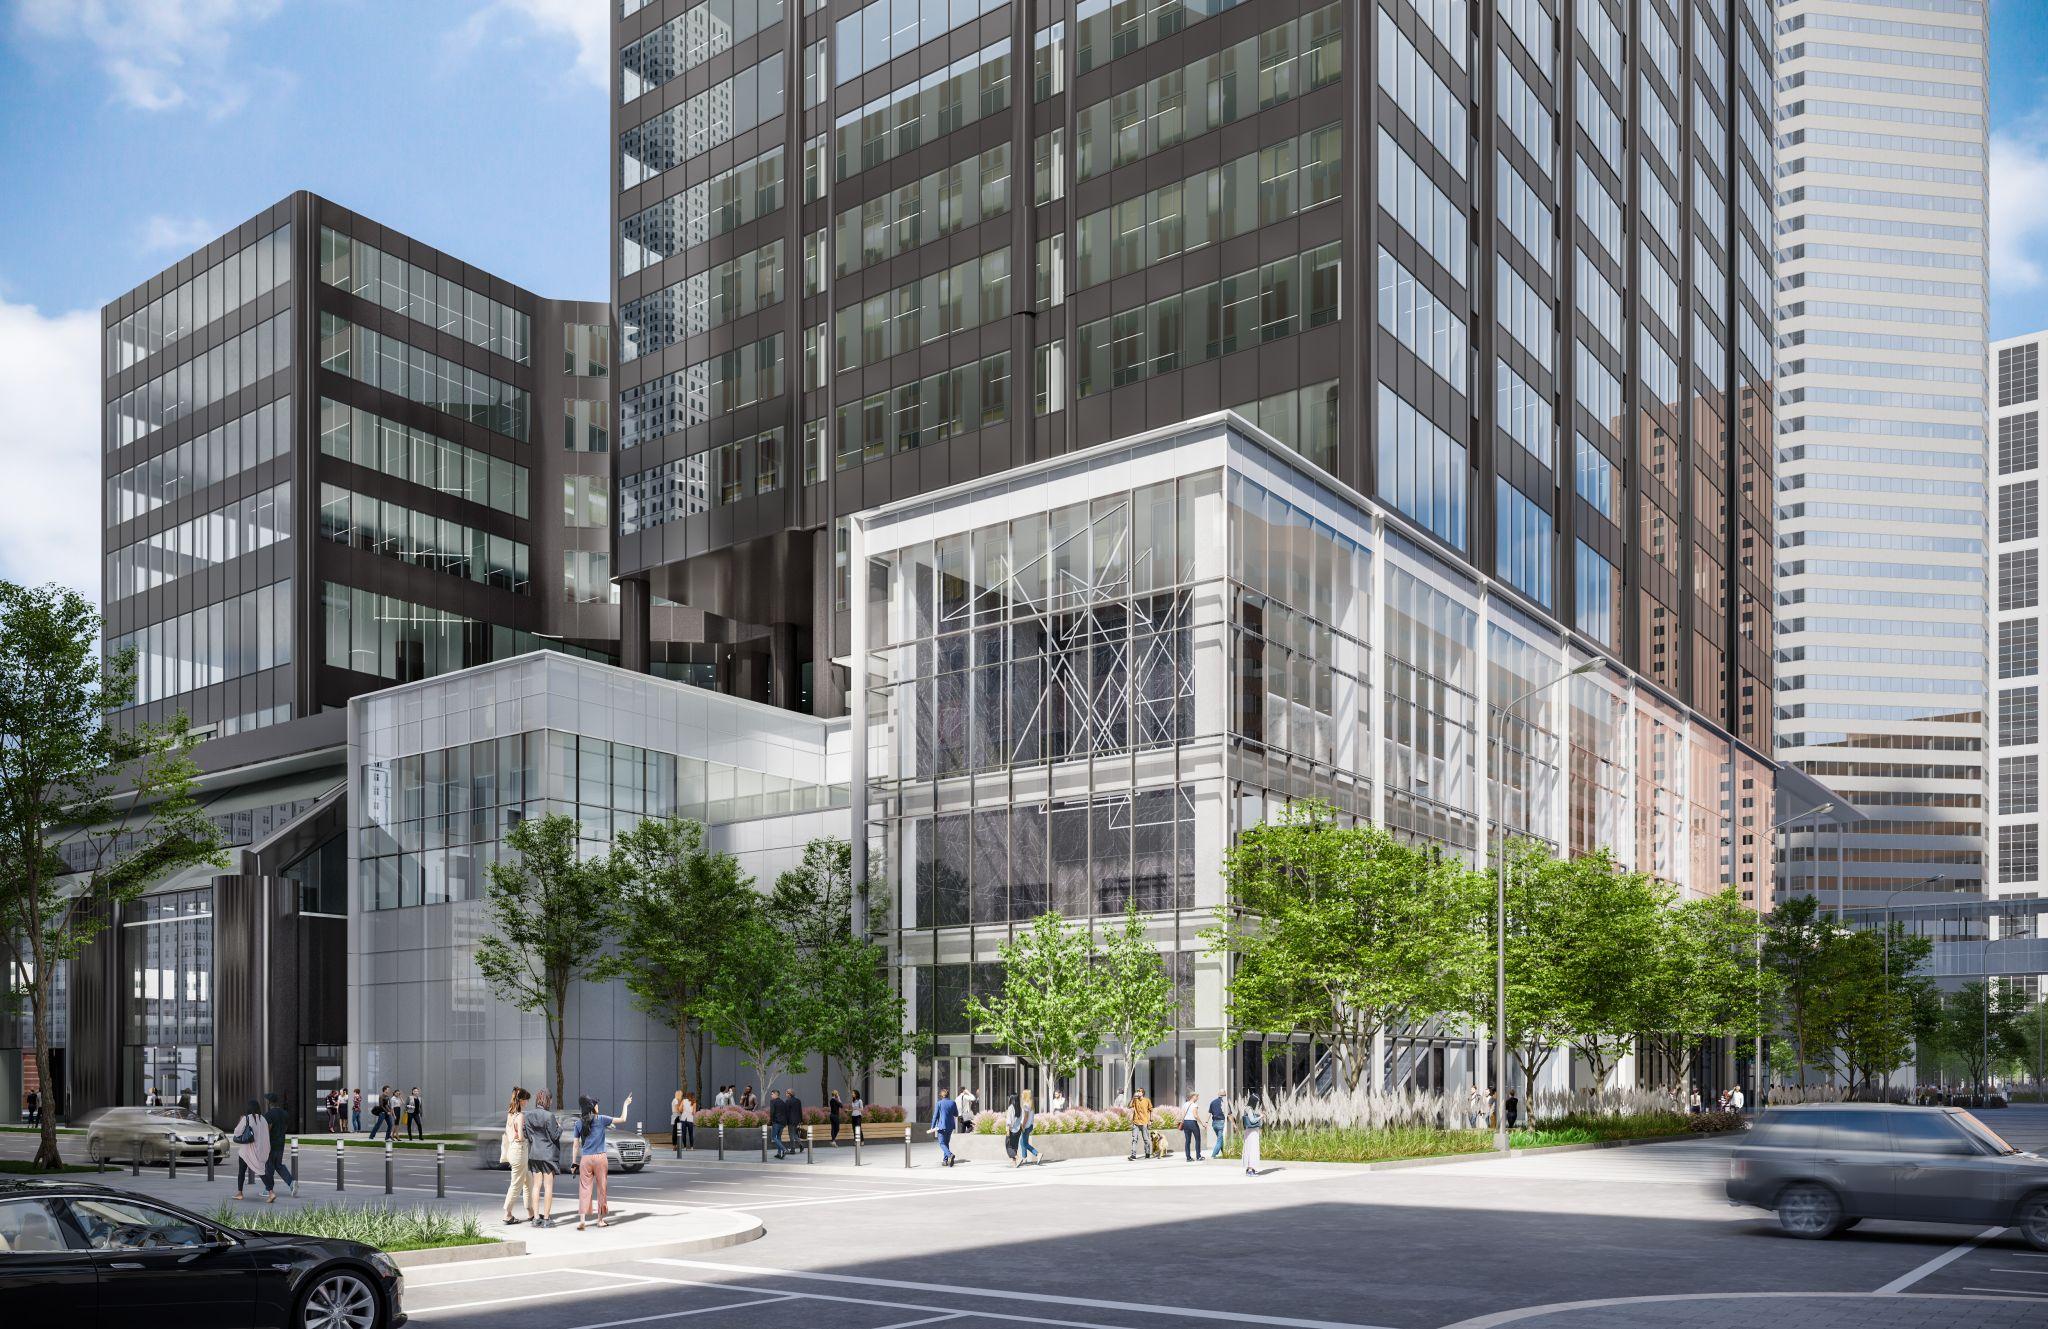 Downtown's Houston Center prepares for makeover